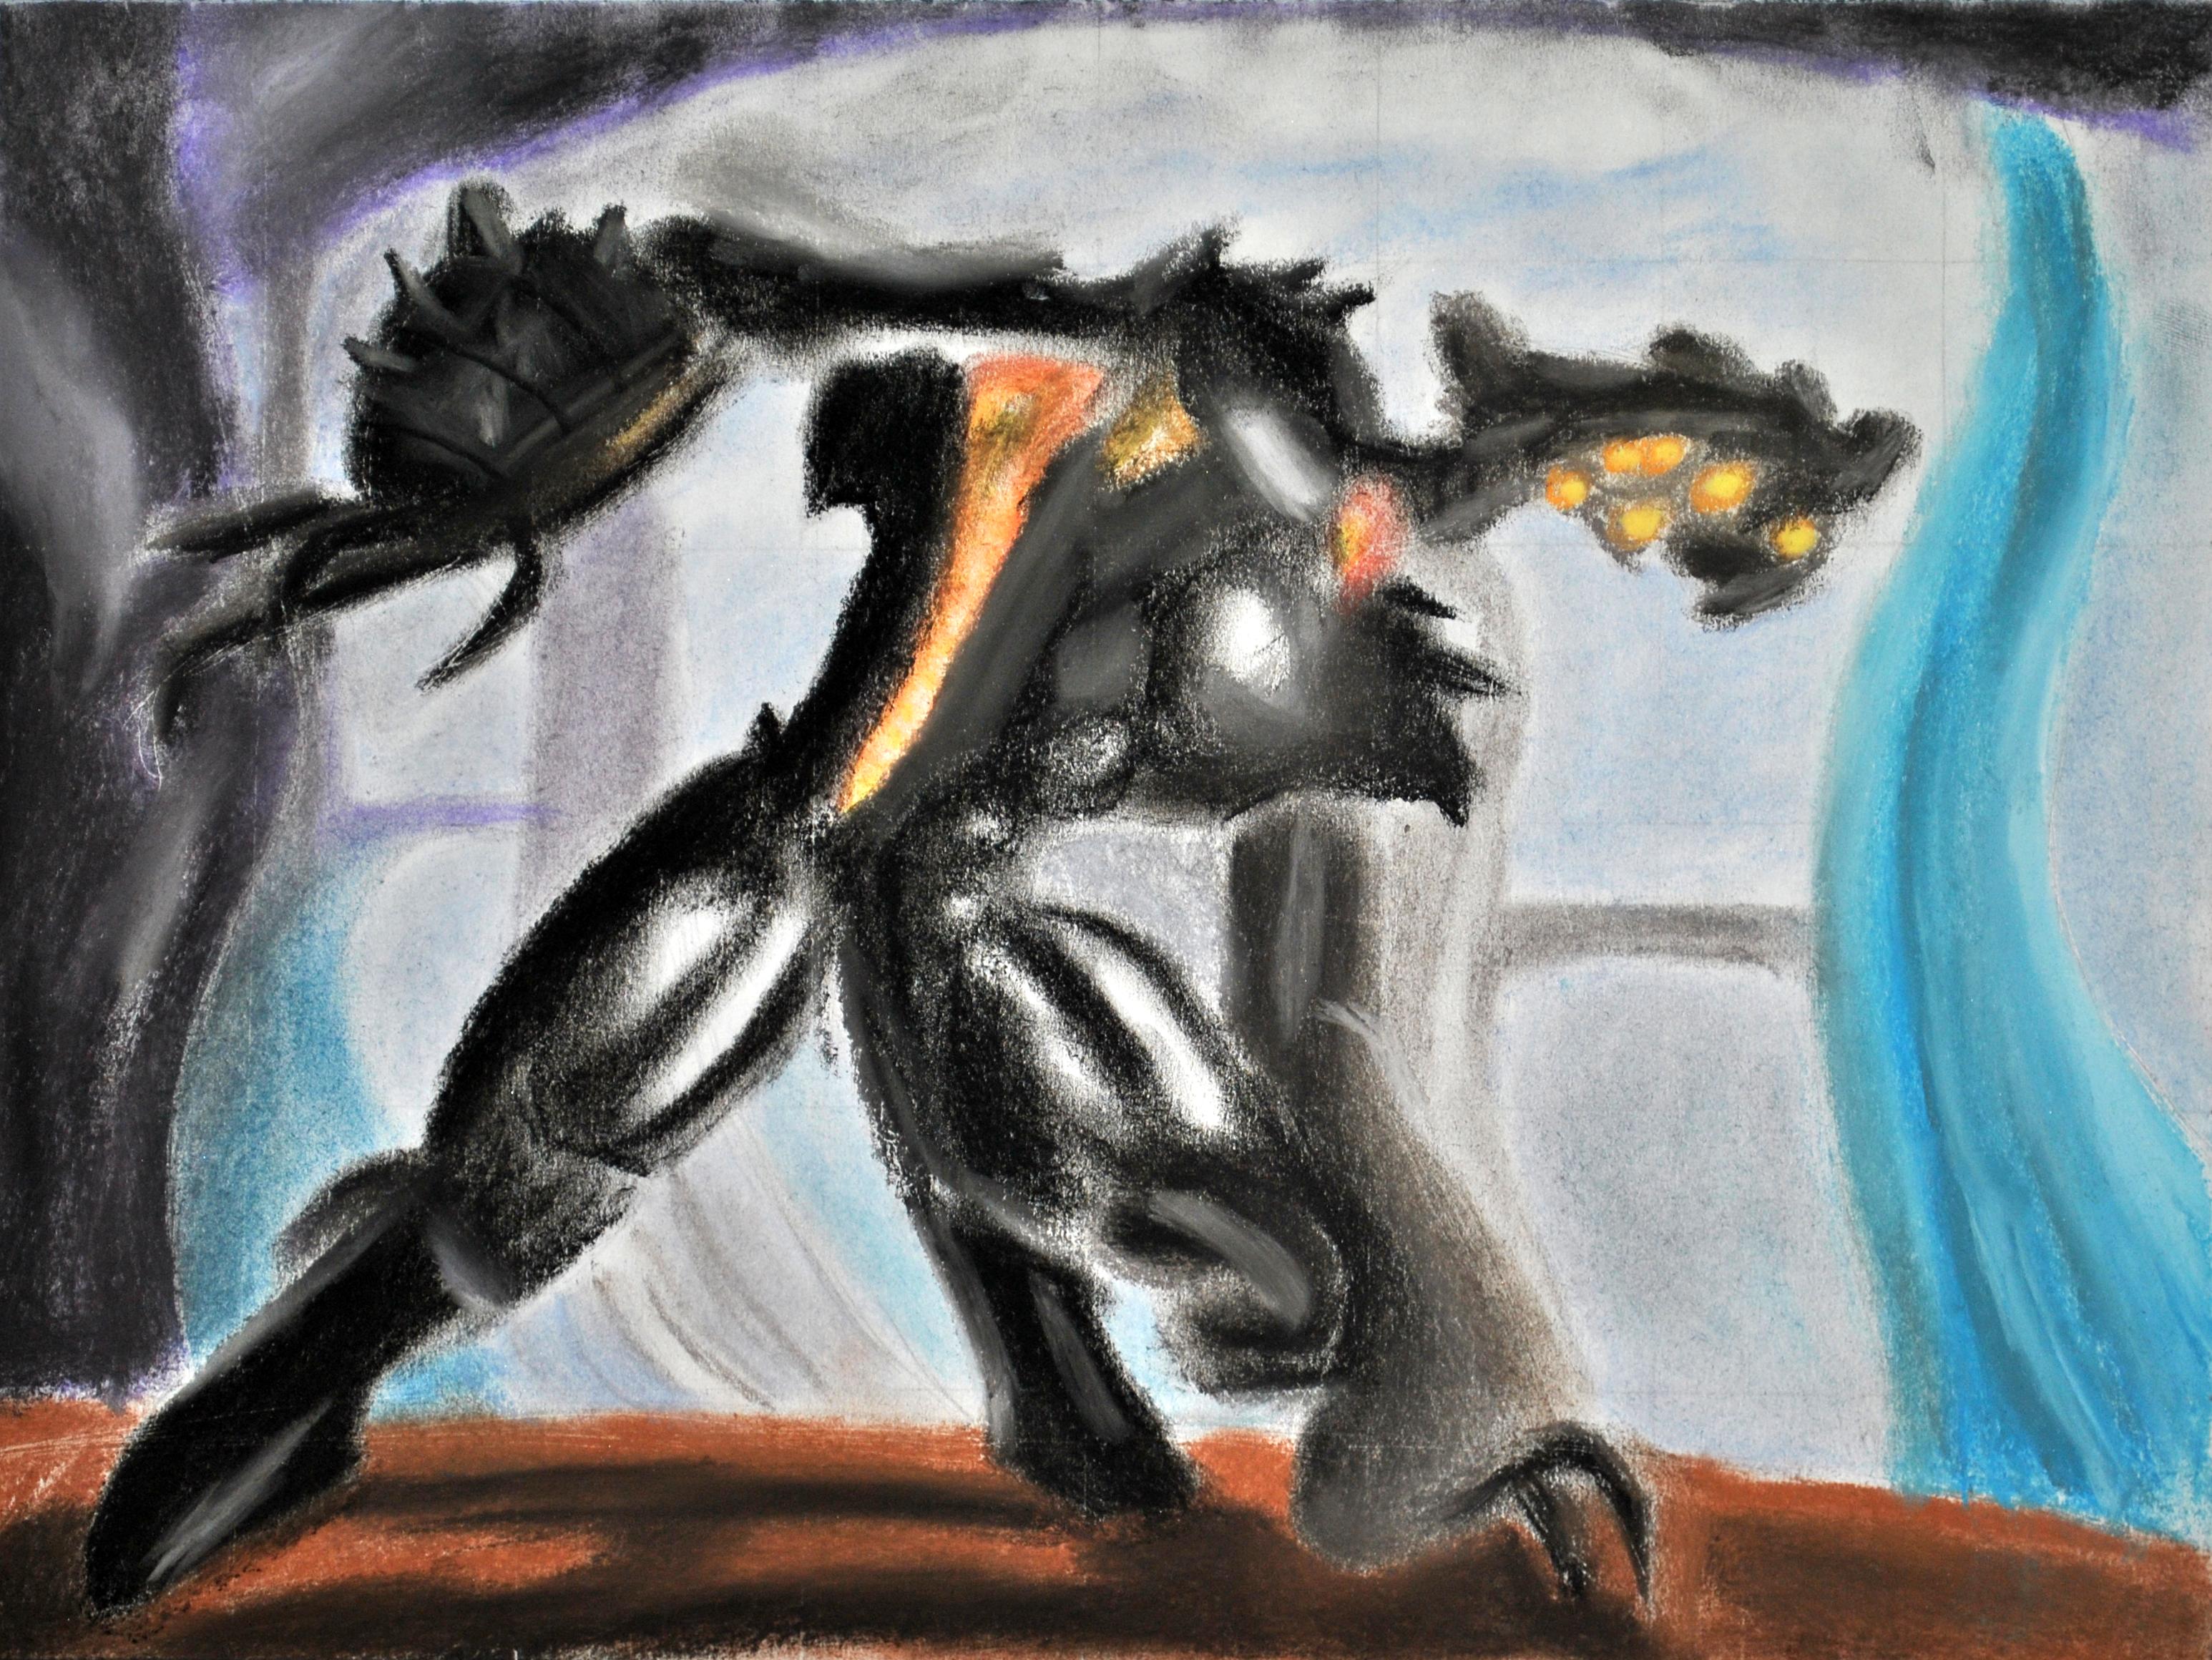 soliton_chalk_drawing_by_brothar5-d5uv8m